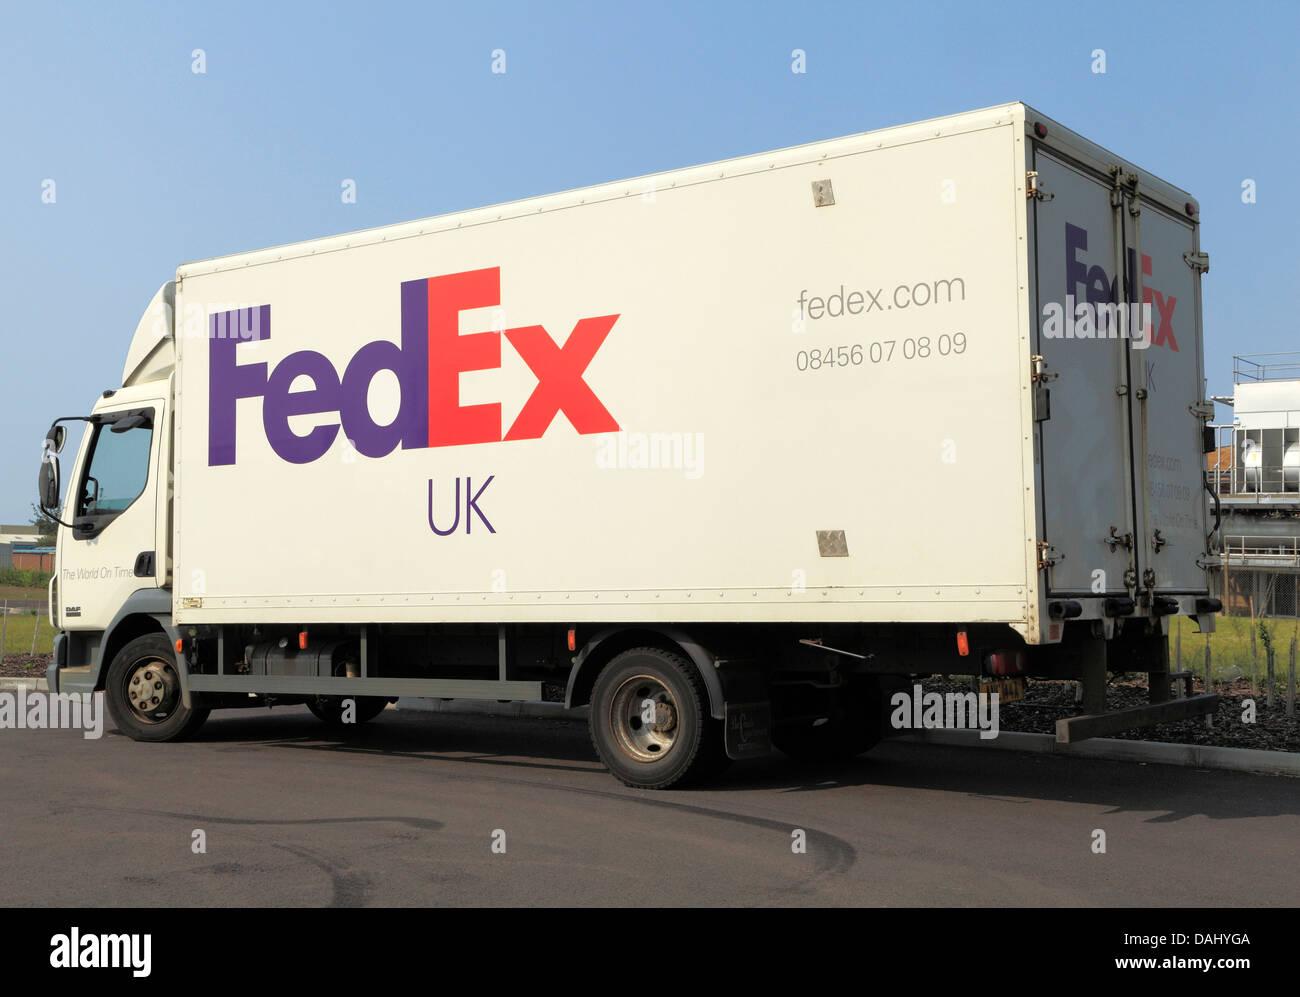 Transporte Fed Ex transporter truck camión Inglaterra firmar el logotipo de FedEx Foto de stock